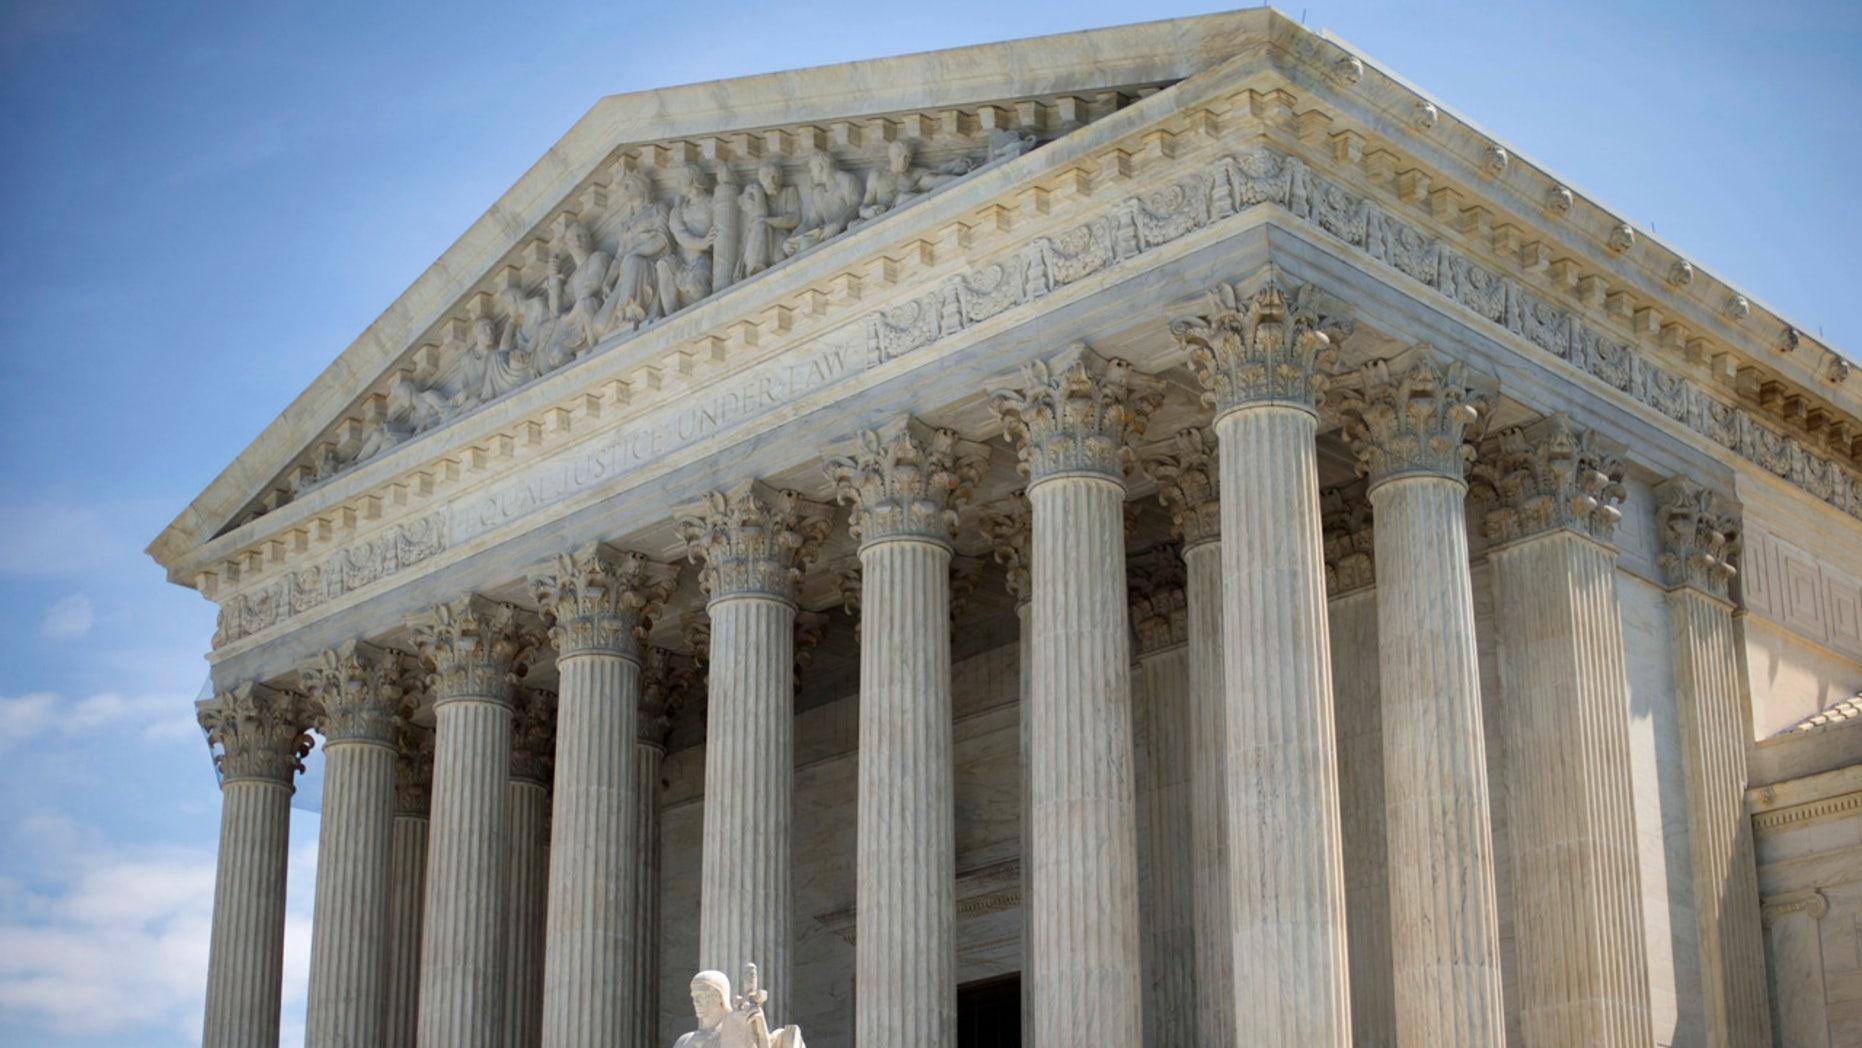 June 30, 2014: The Supreme Court in Washington, D.C.